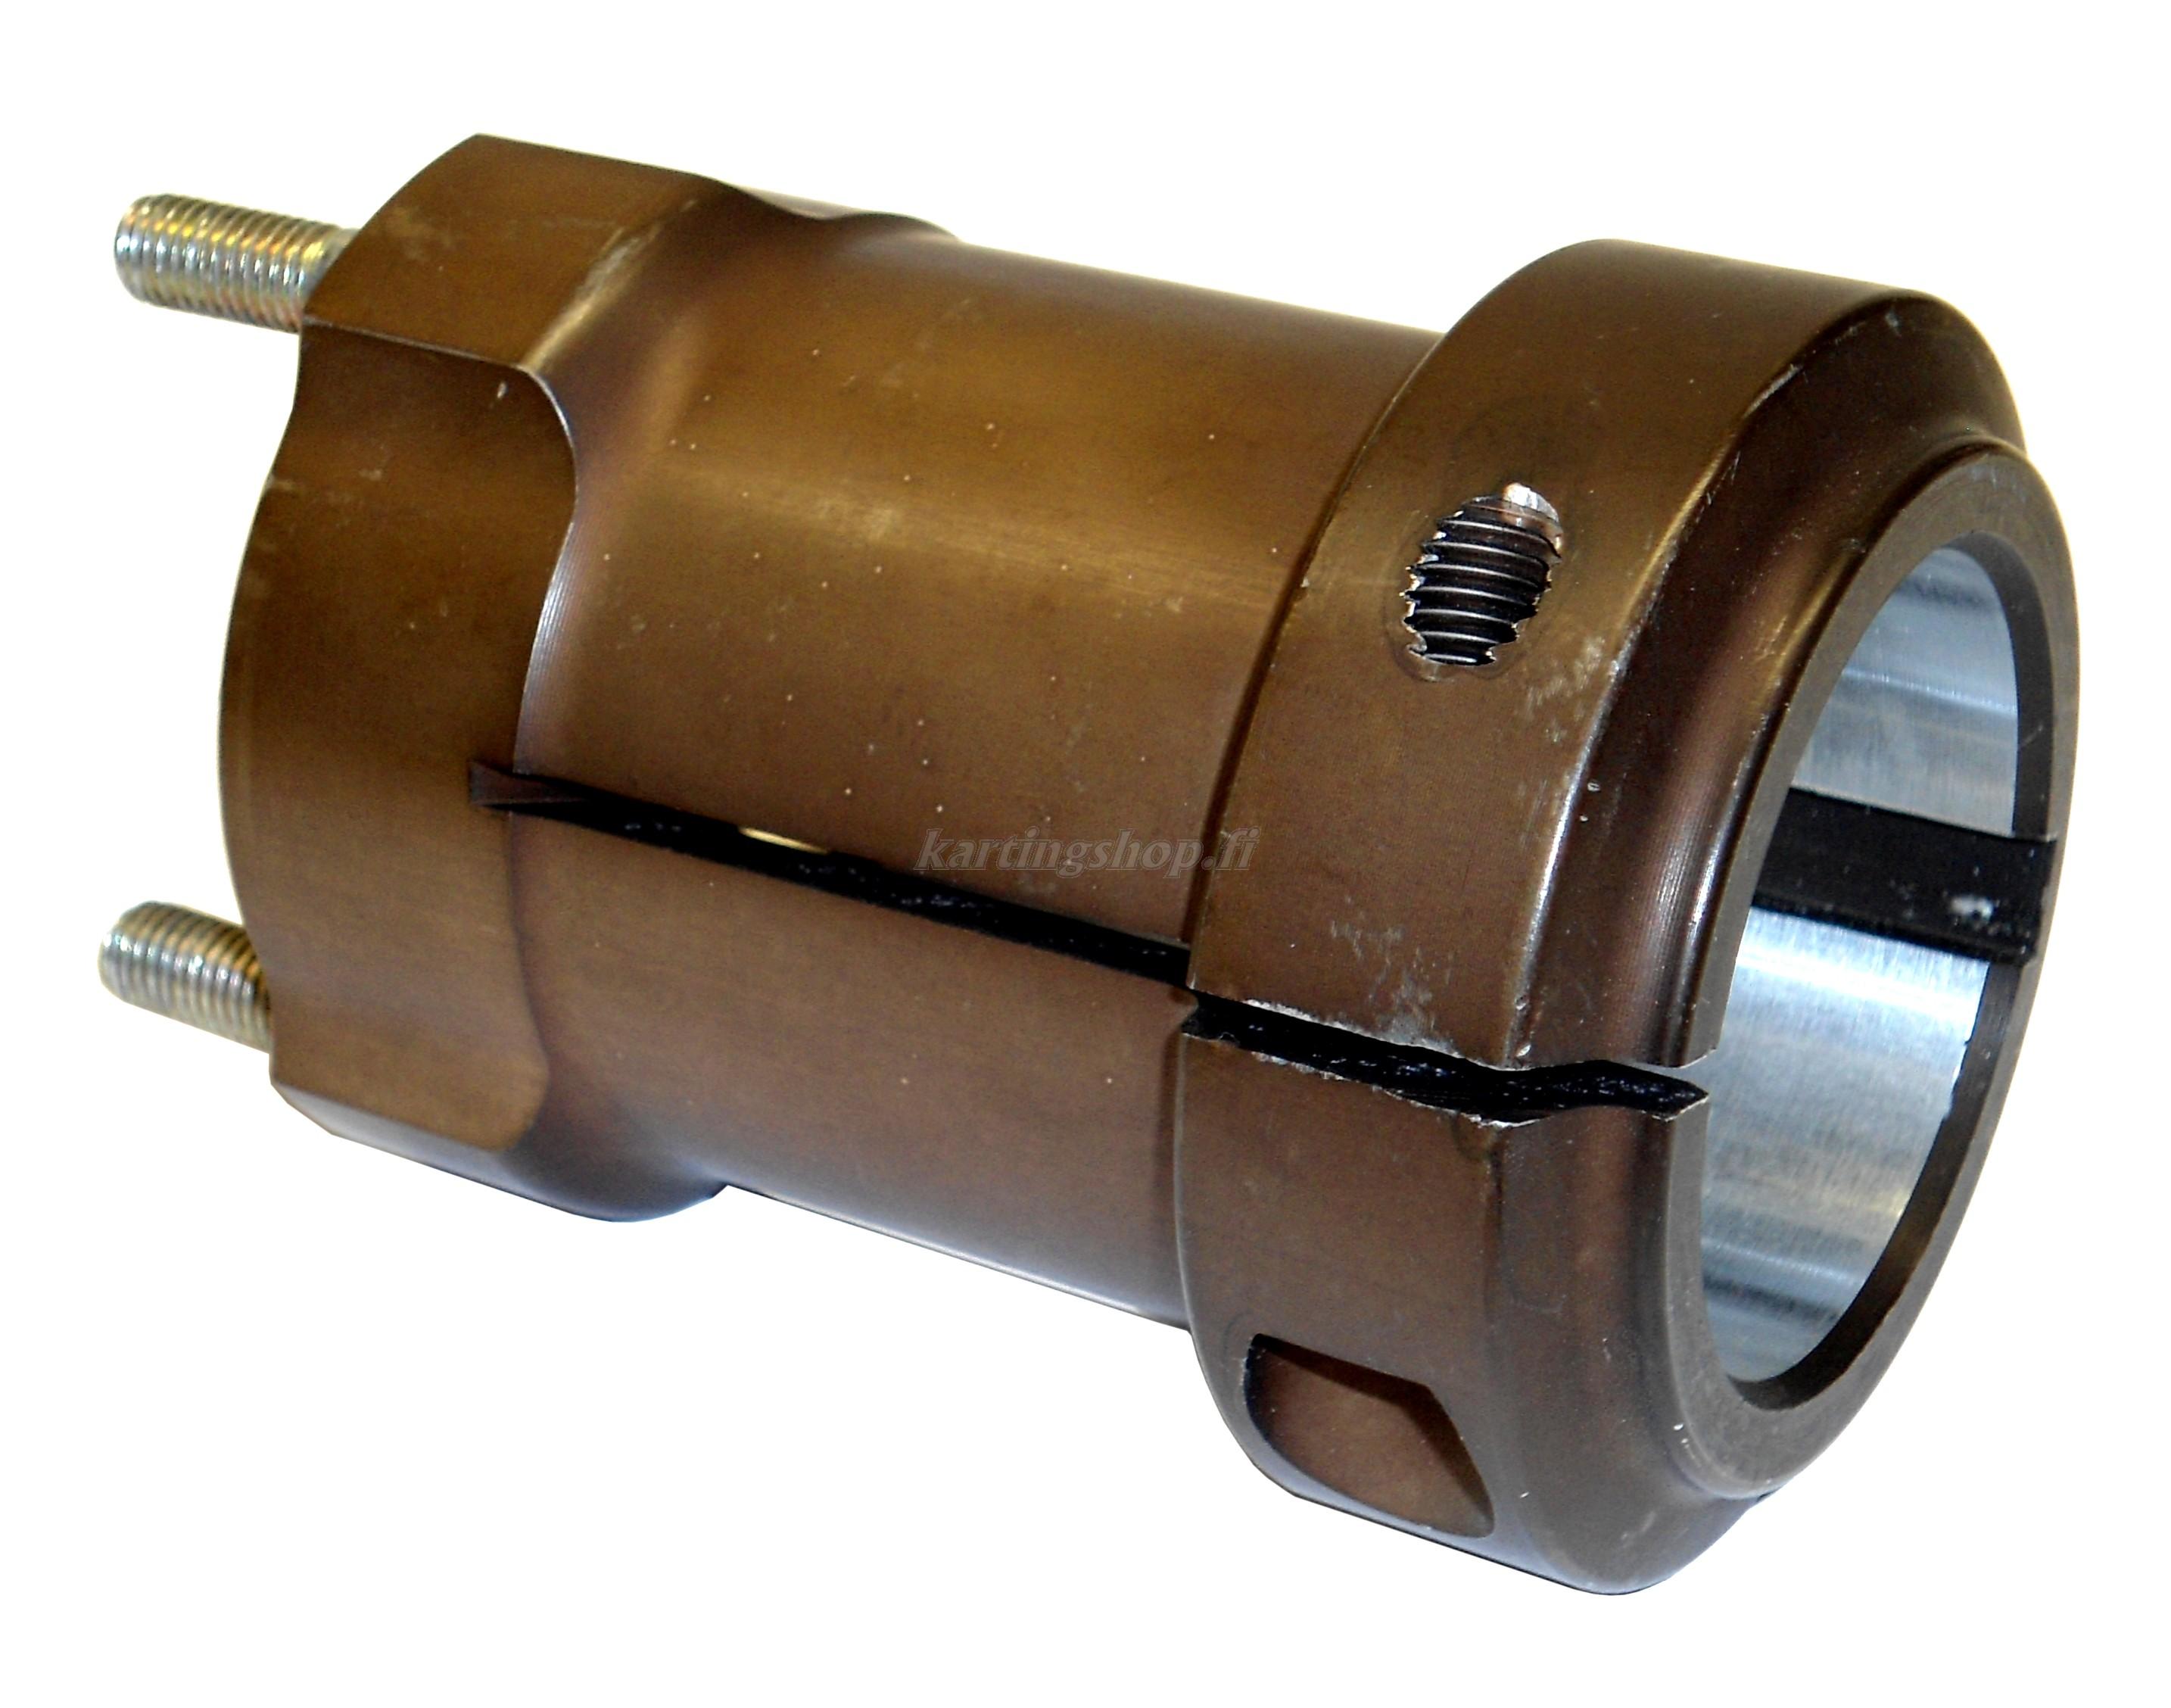 Takanapa alumiini Ø50mm pituus 105mm Maranello, Huom hinta/kappale